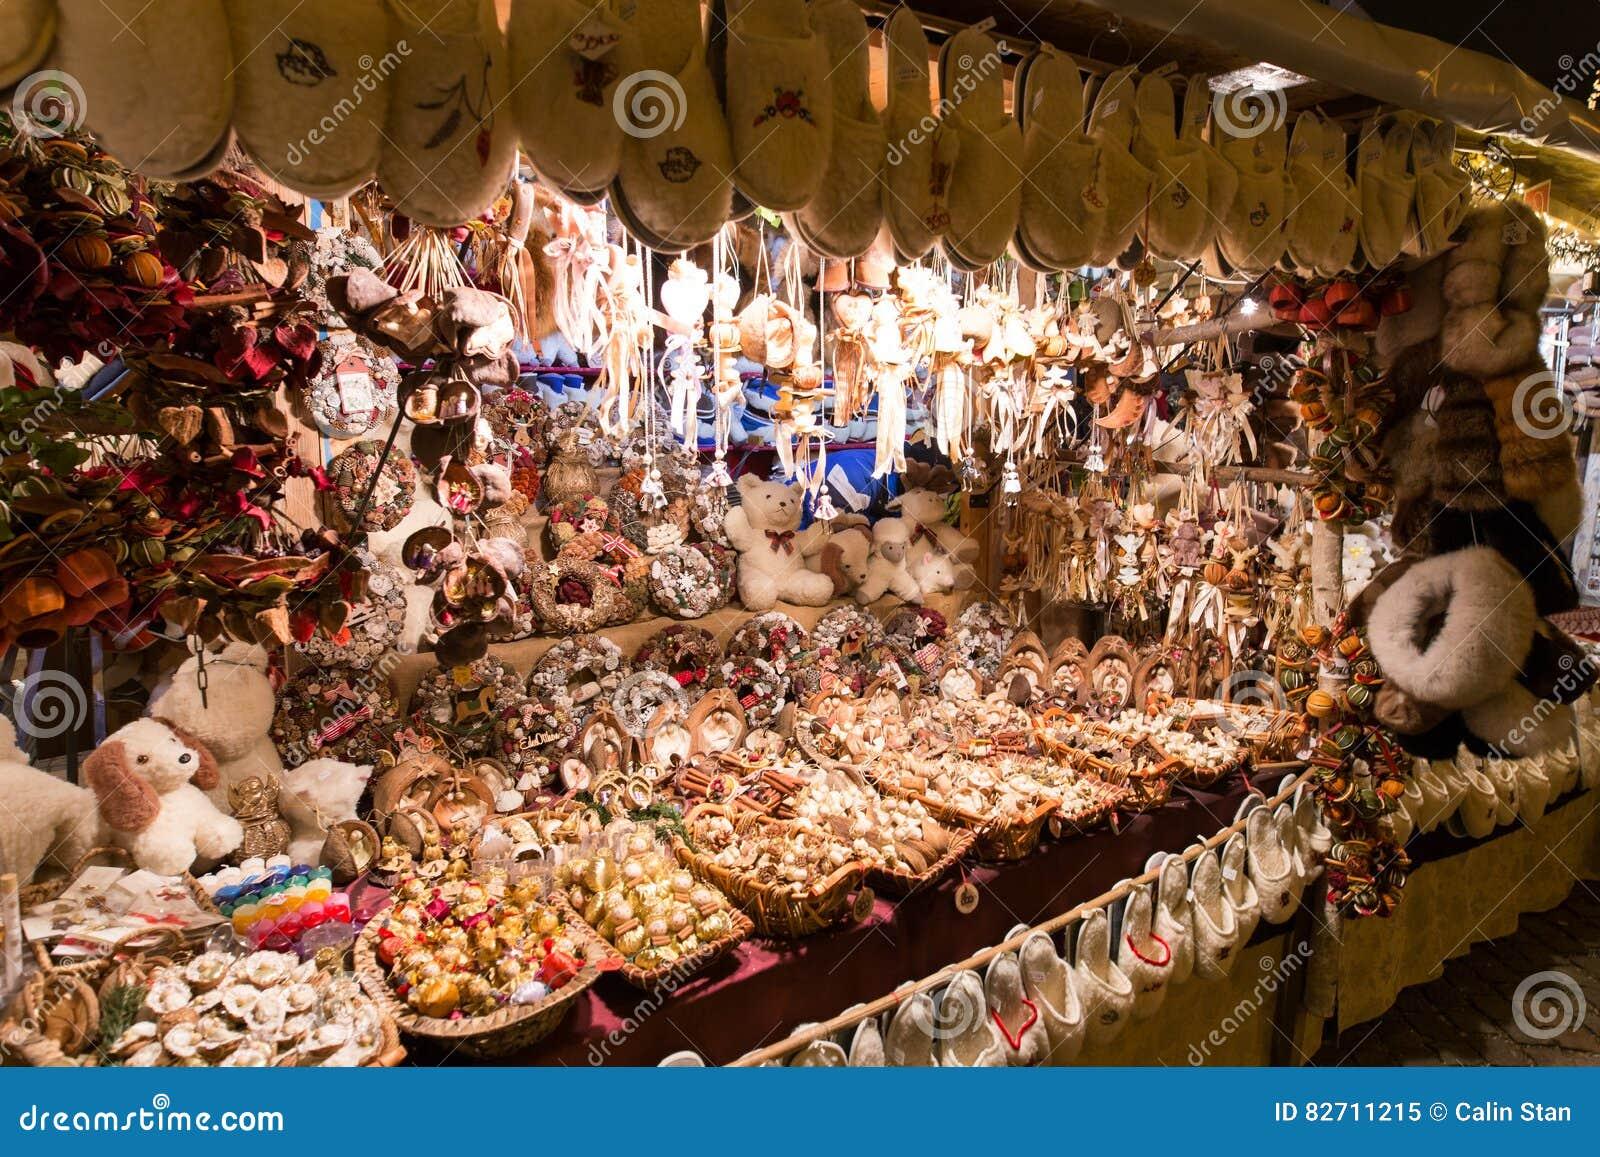 download budapest christmas market stock image image of shank 82711215